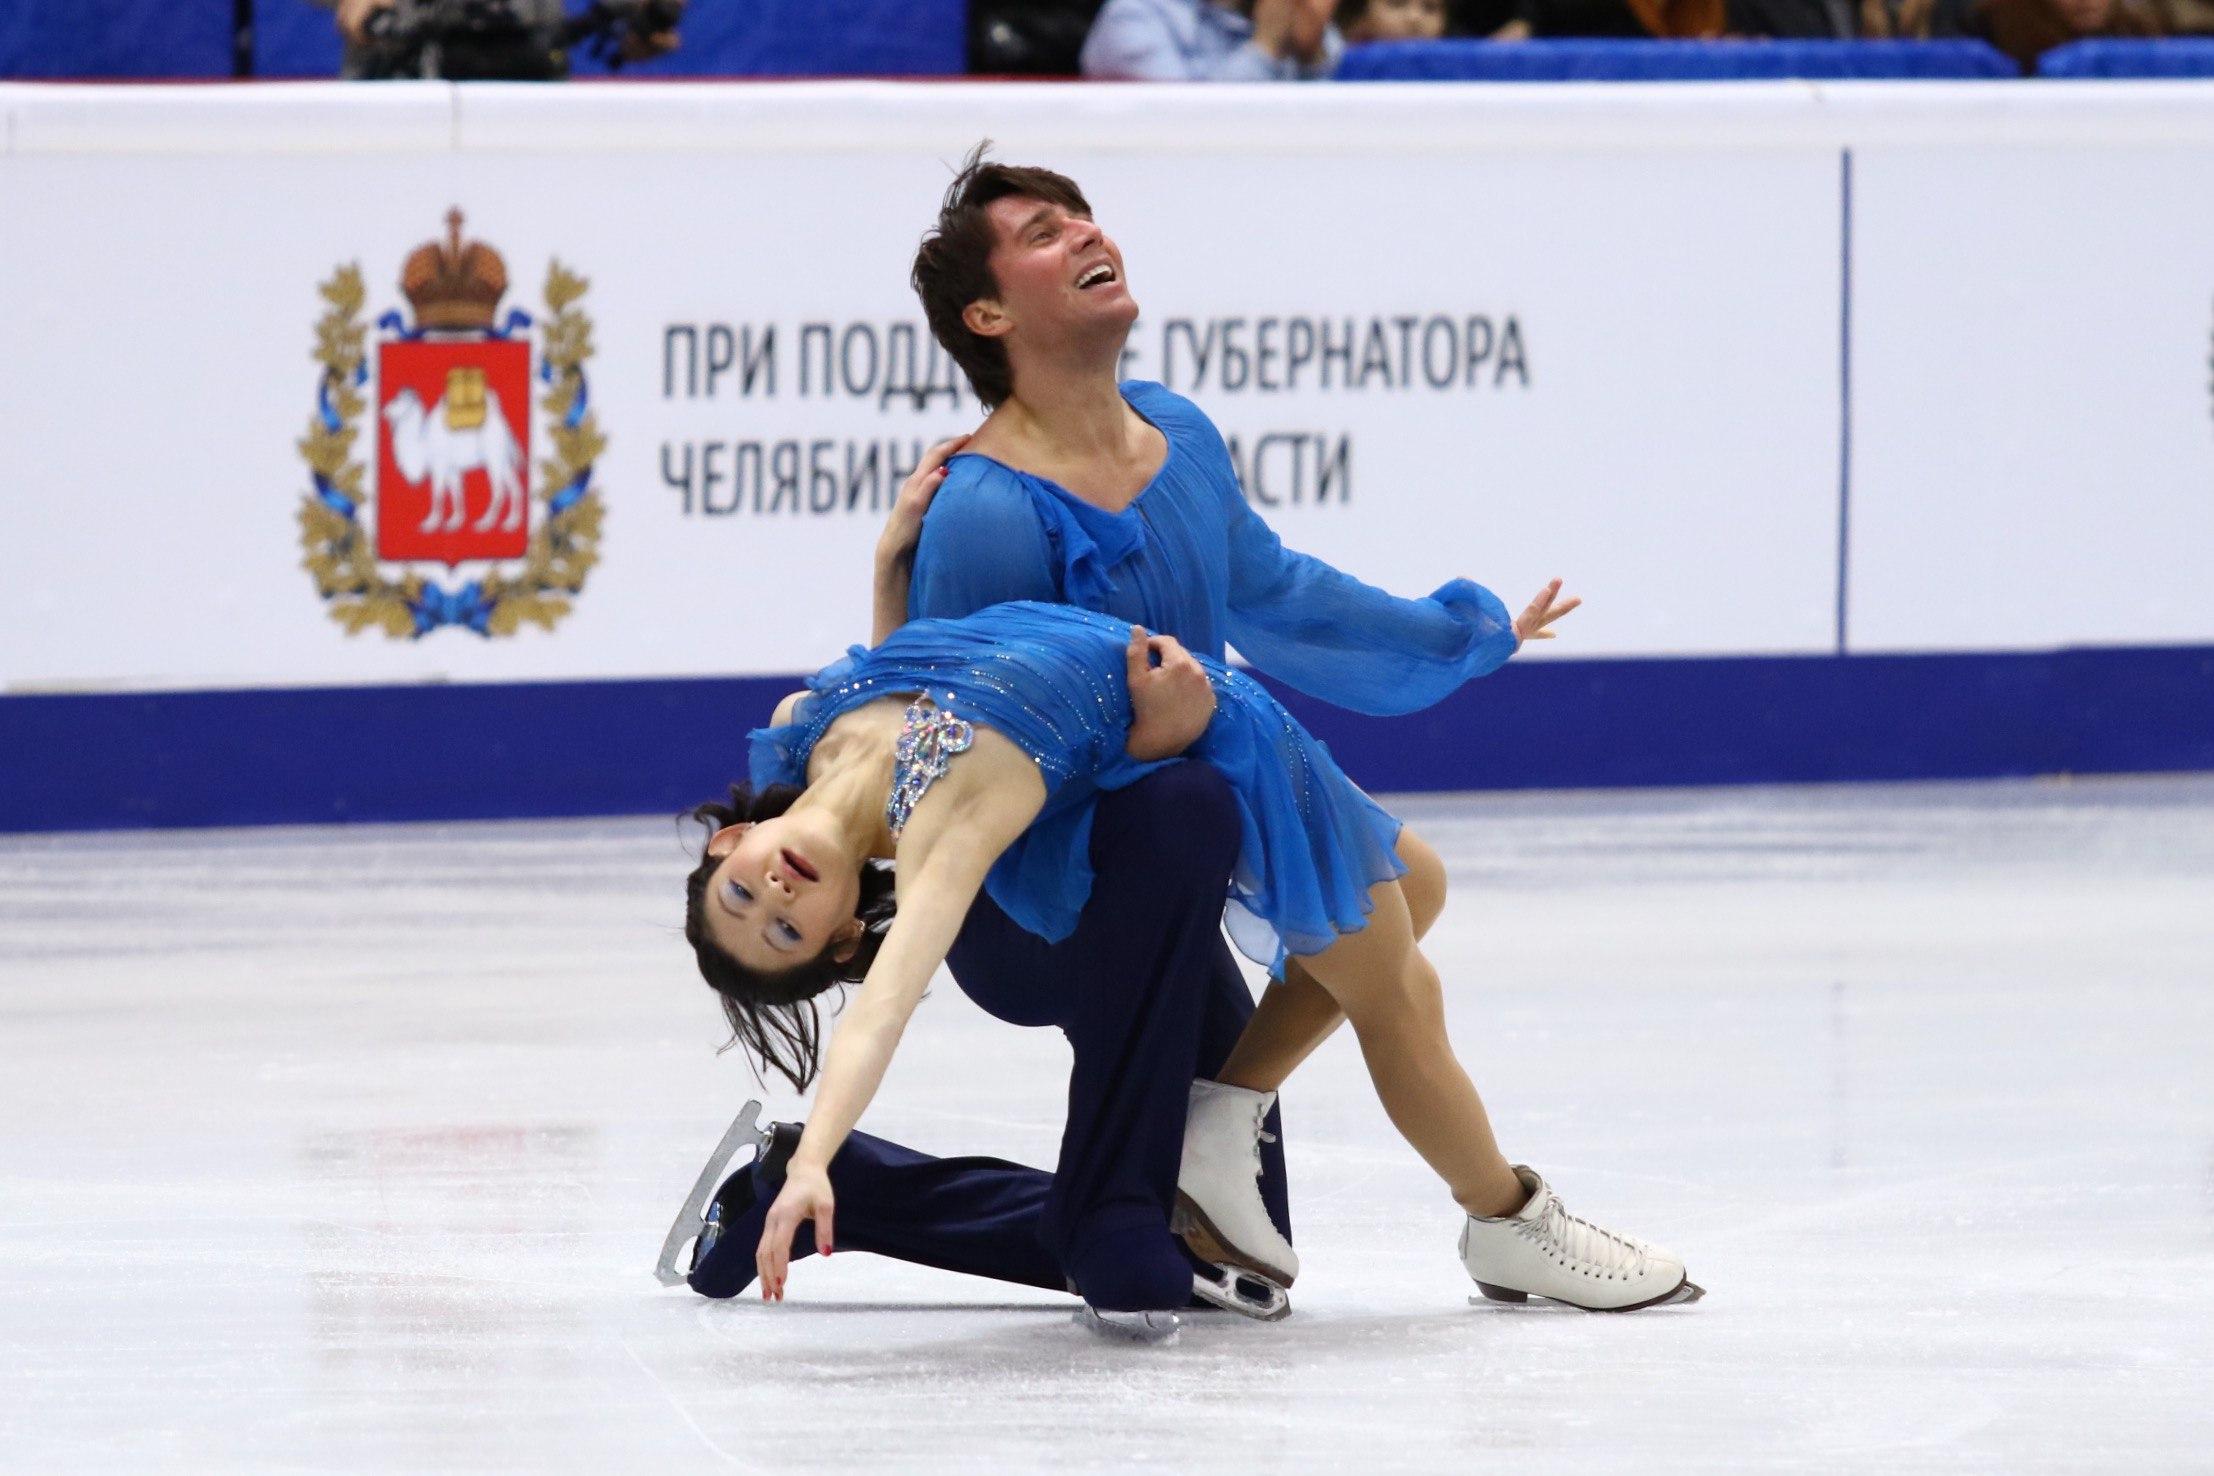 Юко Кавагути и Александр Смирнов (26.12.2016)